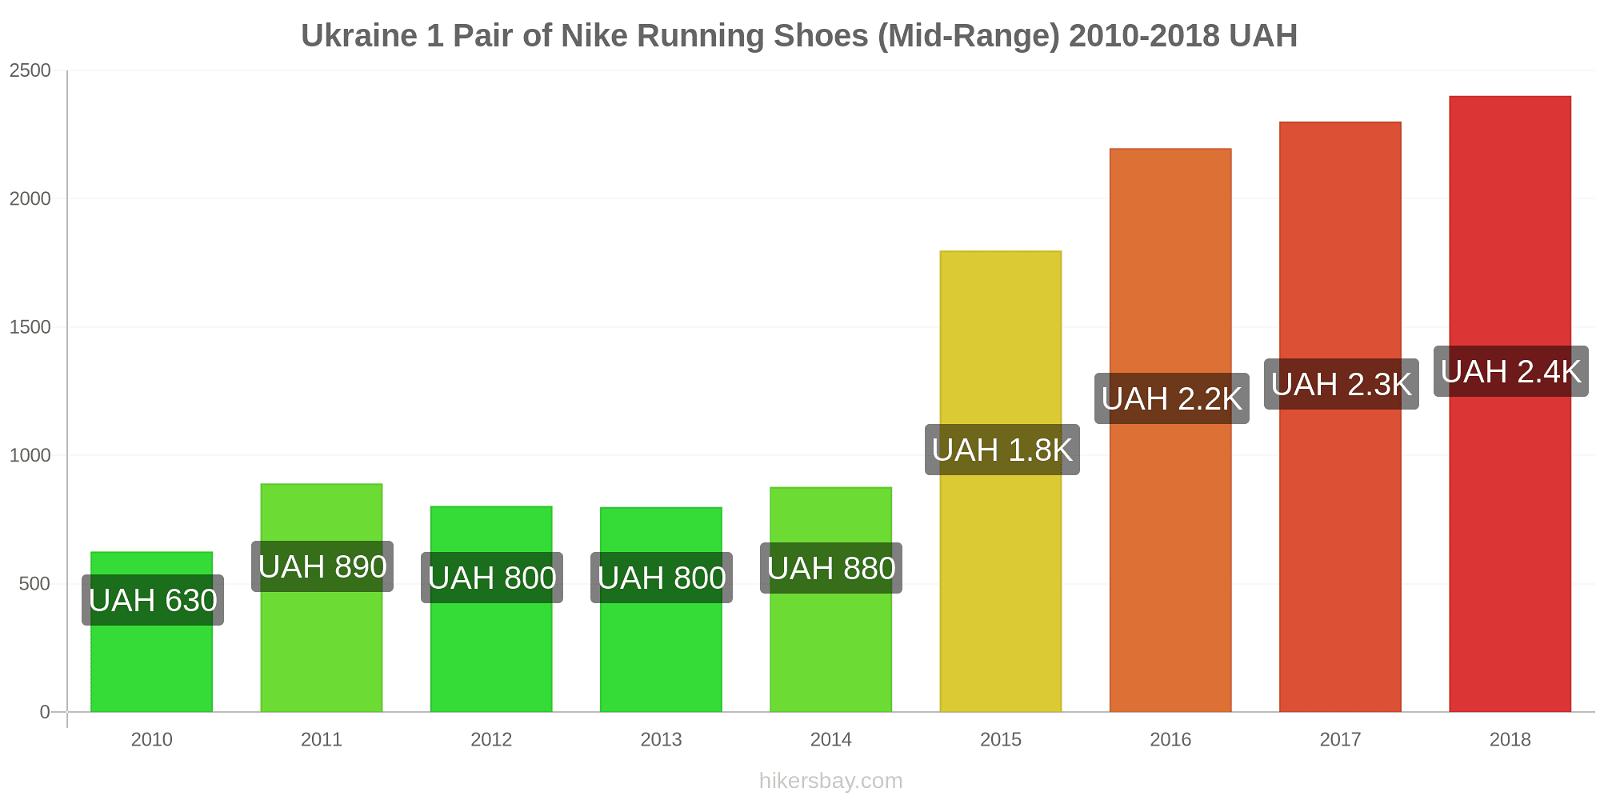 Ukraine price changes 1 Pair of Nike Running Shoes (Mid-Range) hikersbay.com